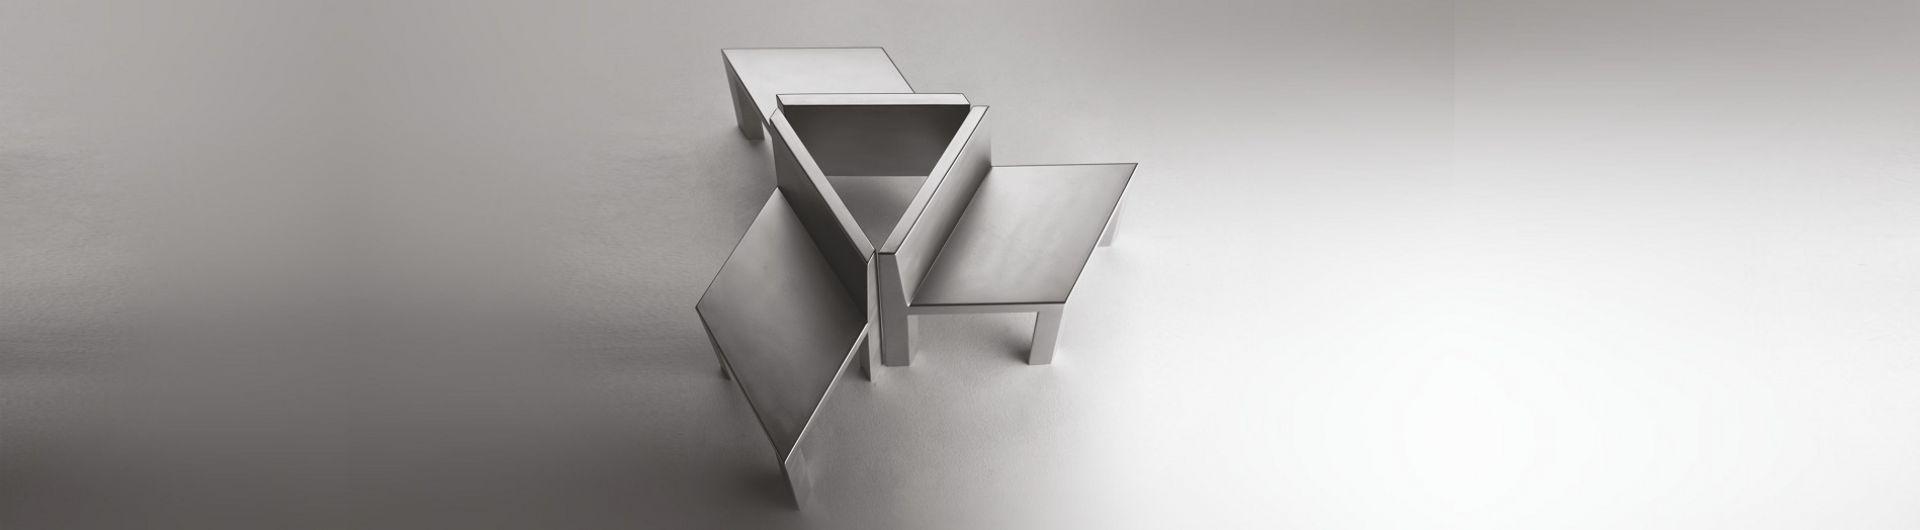 assises-chaises-ISOMETRICA-METALCO- MOBILCONCEPTS-design-GIULIO-IACCHETTI